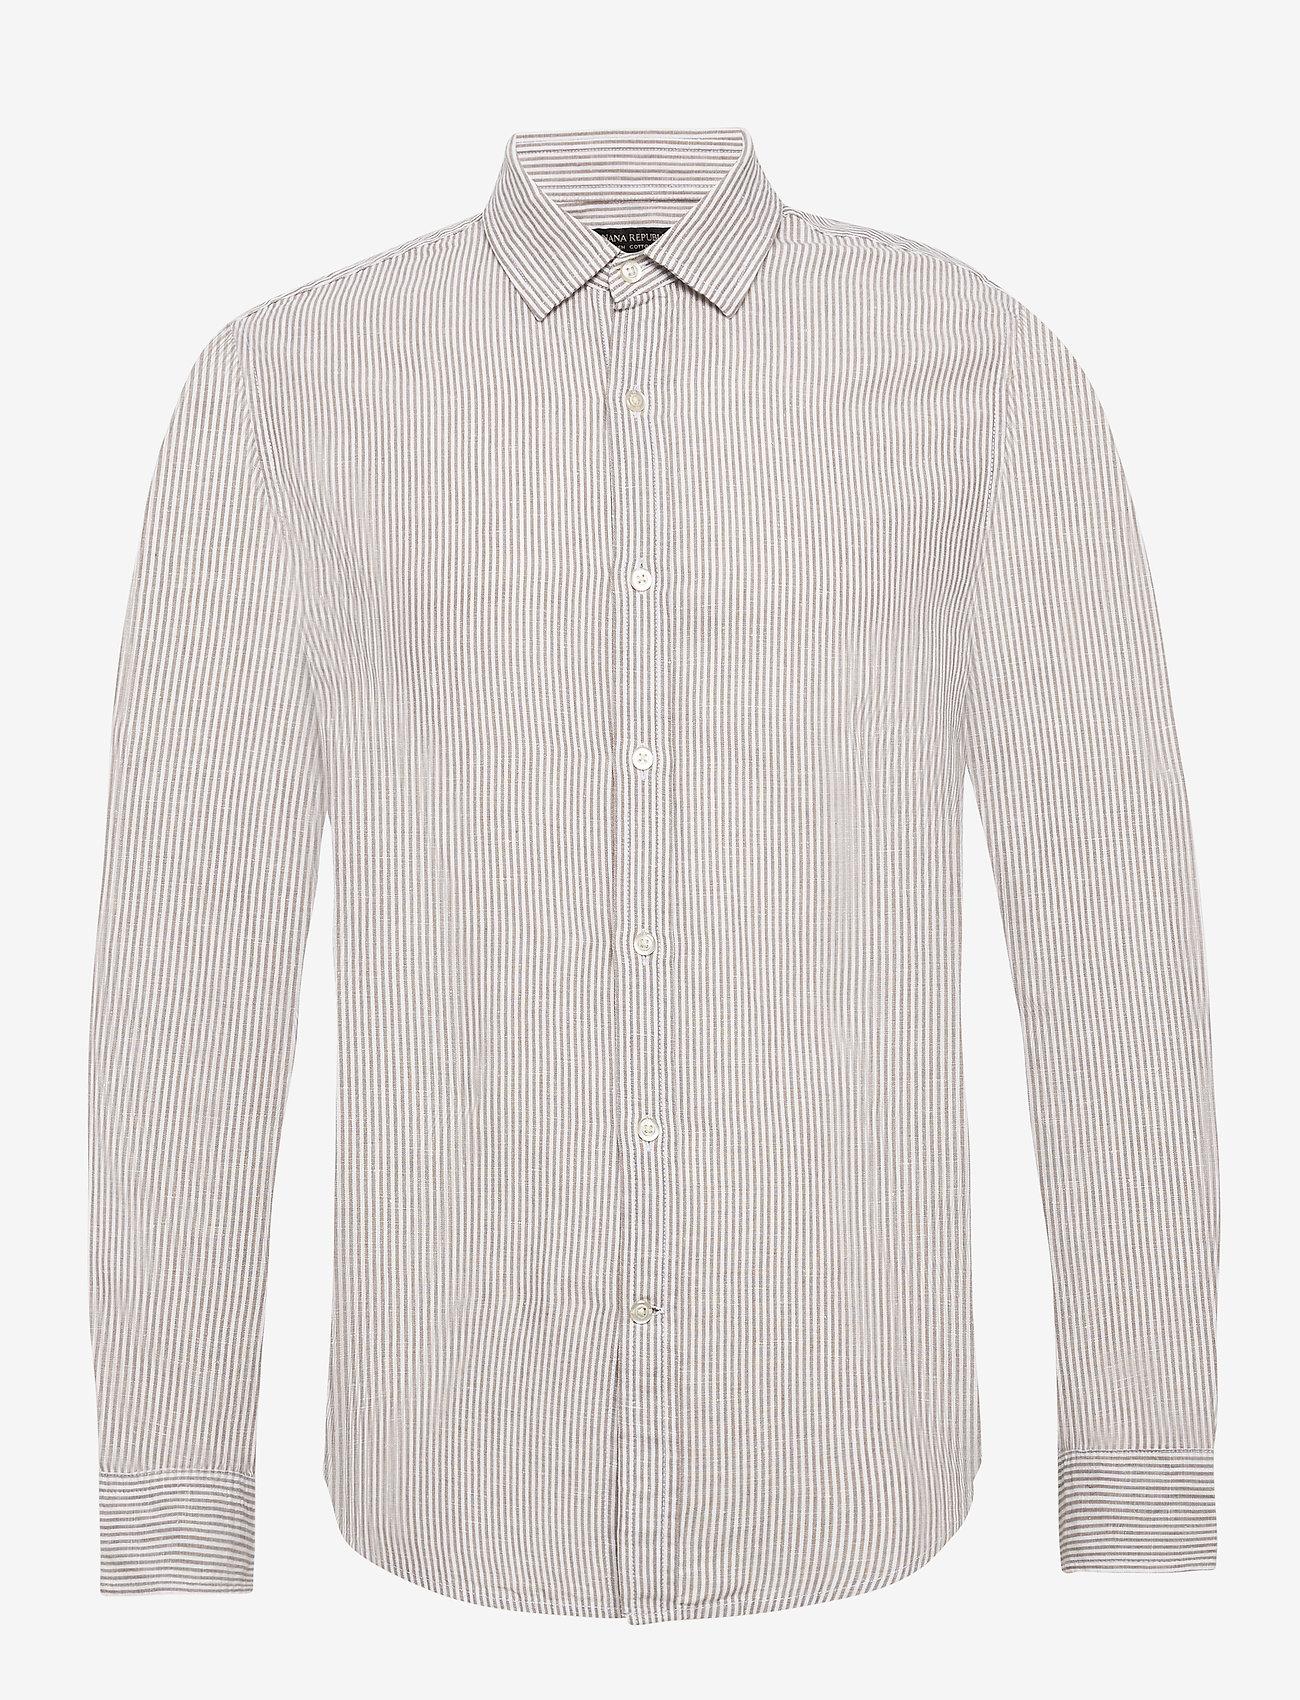 Banana Republic - Untucked Slim-Fit Linen-Cotton Shirt - casual shirts - brown mini stripe - 0